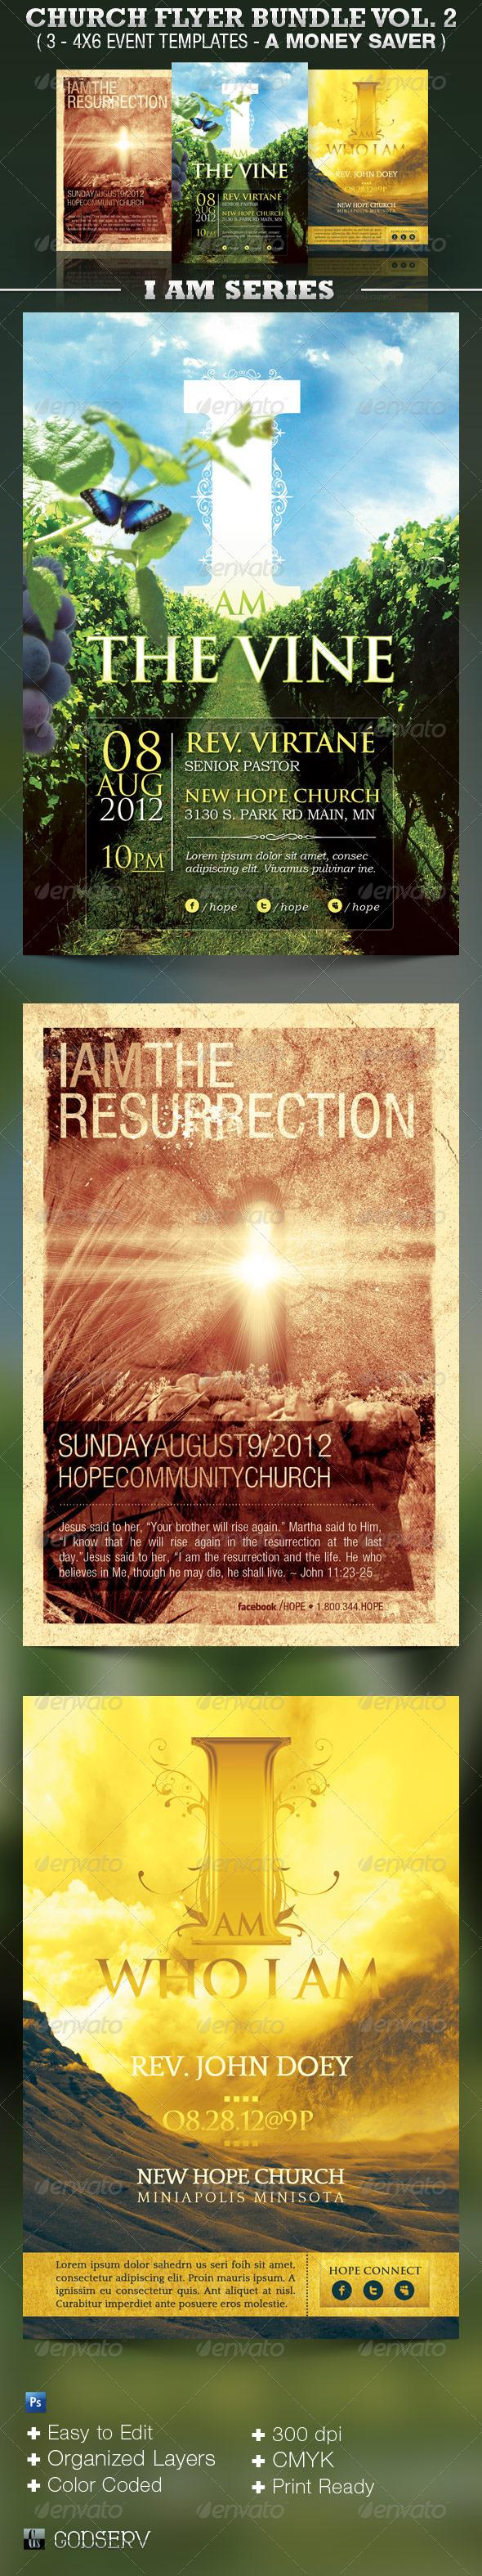 Church Flyer Template Bundle Vol 2 - I AM SERIES  - Church Flyers